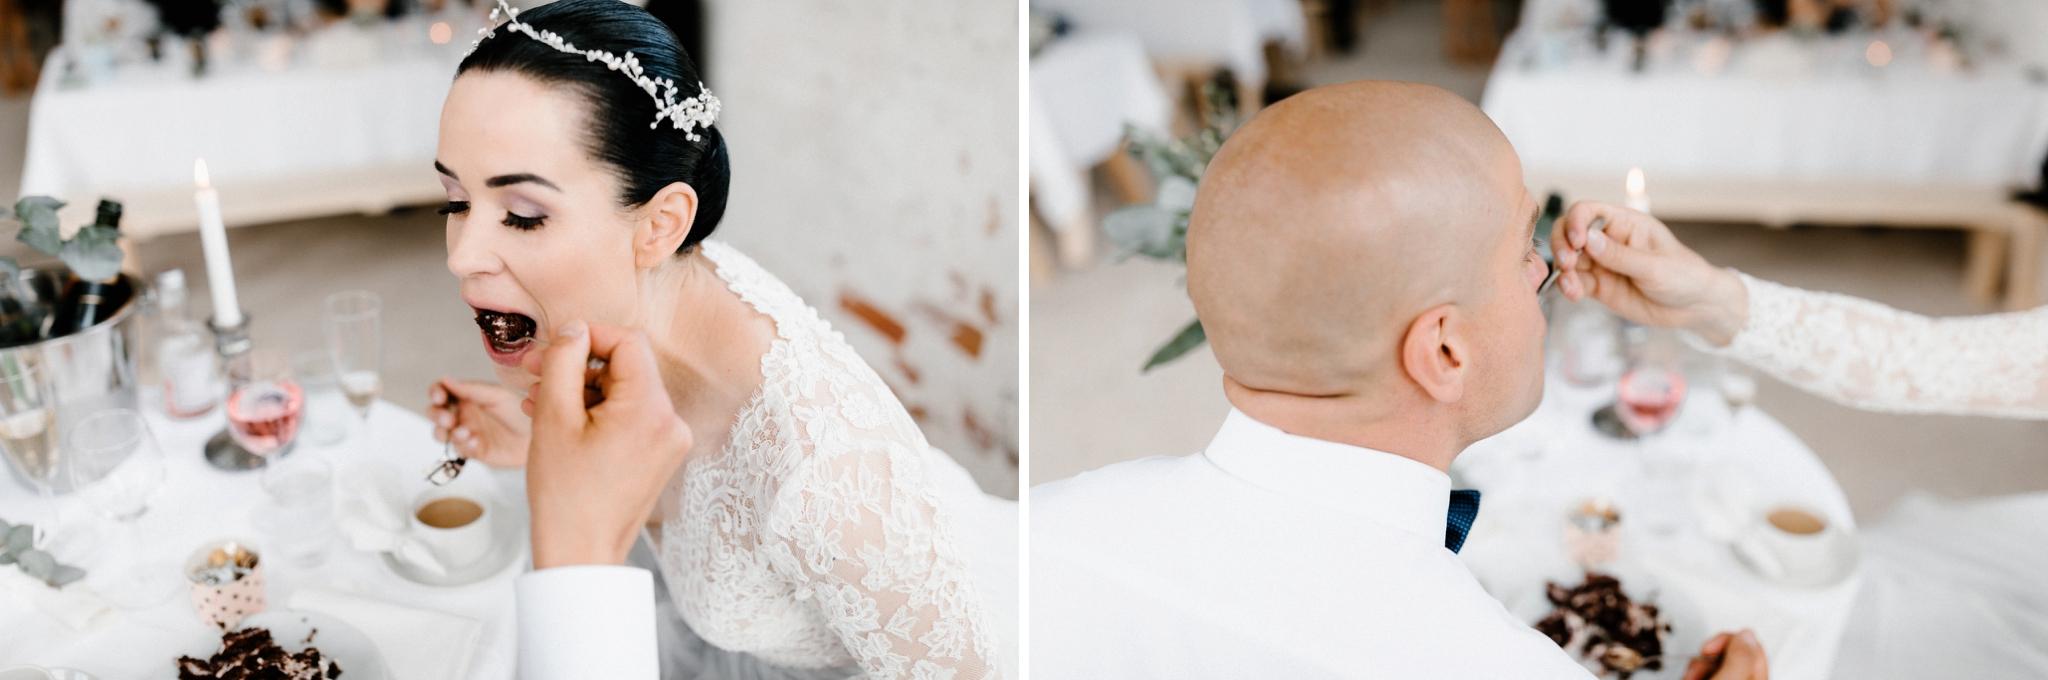 Essi + Ville   Oitbacka Gården   by Patrick Karkkolainen Wedding Photography-256.jpg